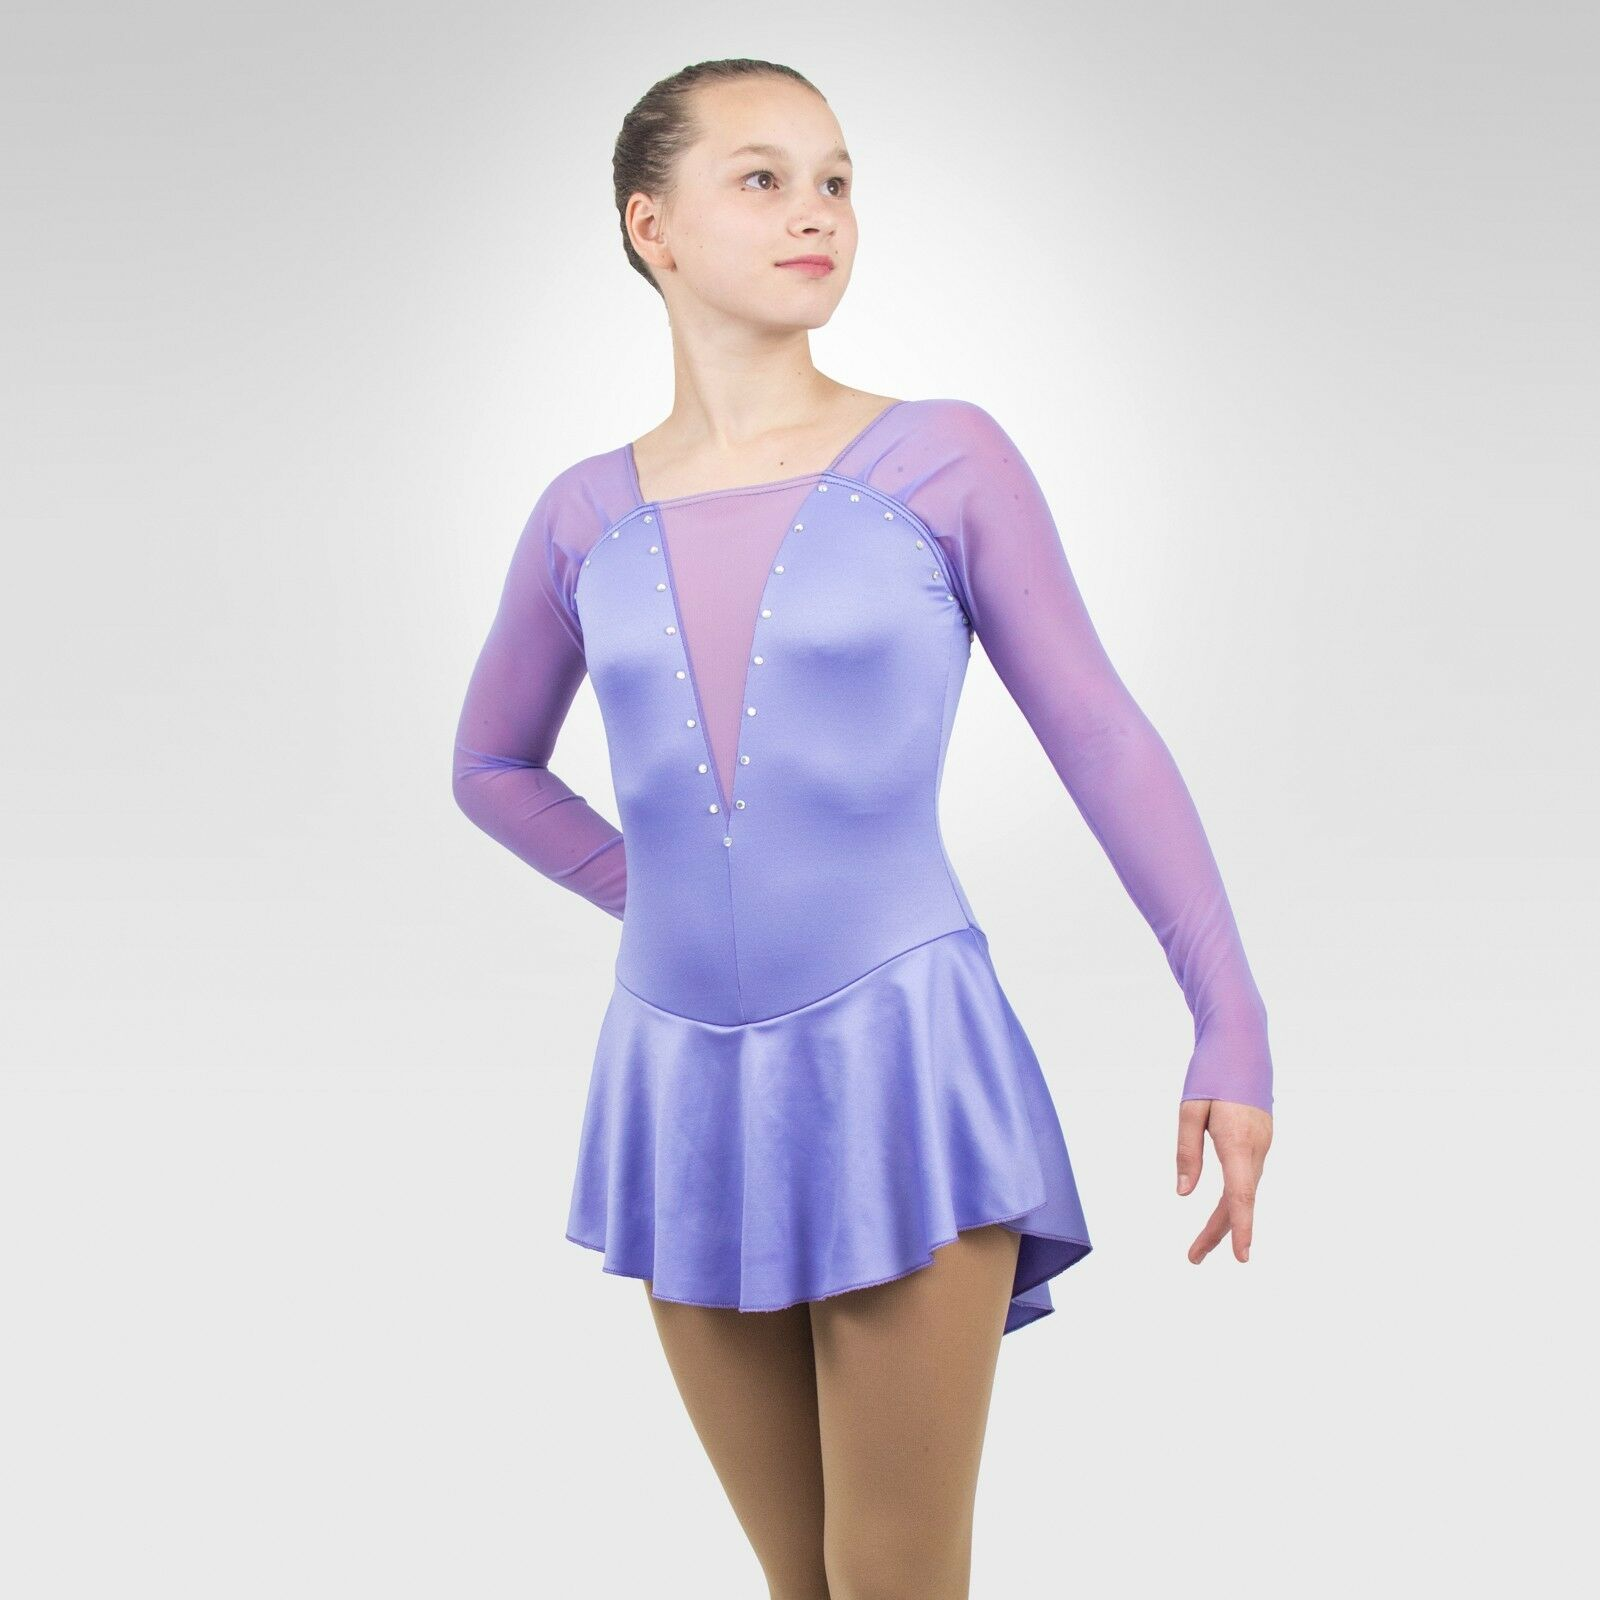 Ice Skating Figure Skating  Dress Größe XSMALL adult lavender Farbe